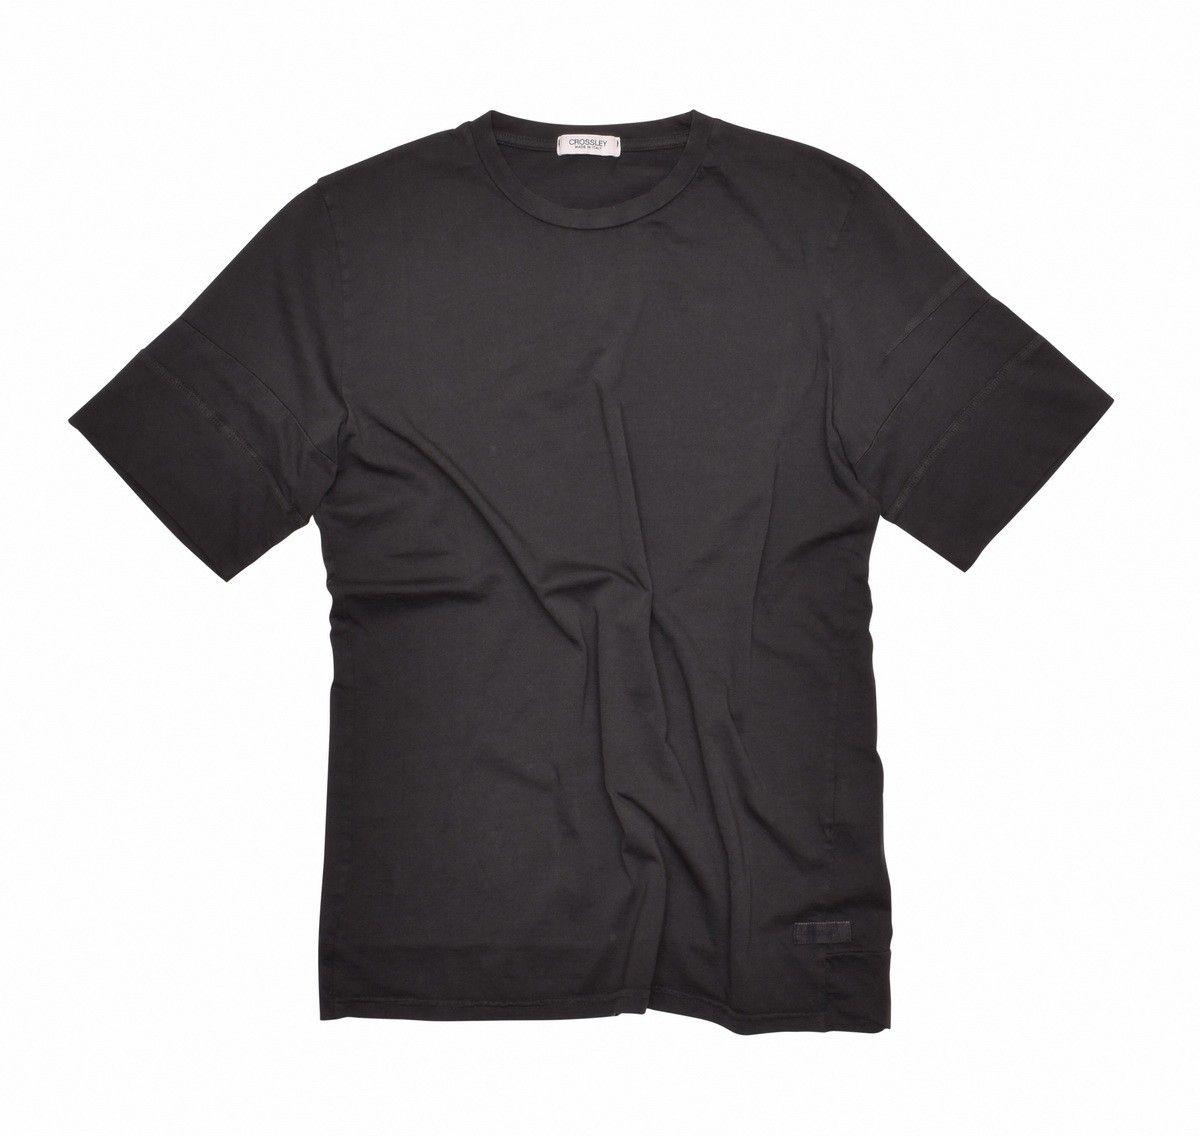 CROSSLEY - Herren T-Shirt - JANOS Uomo MM - dark green -